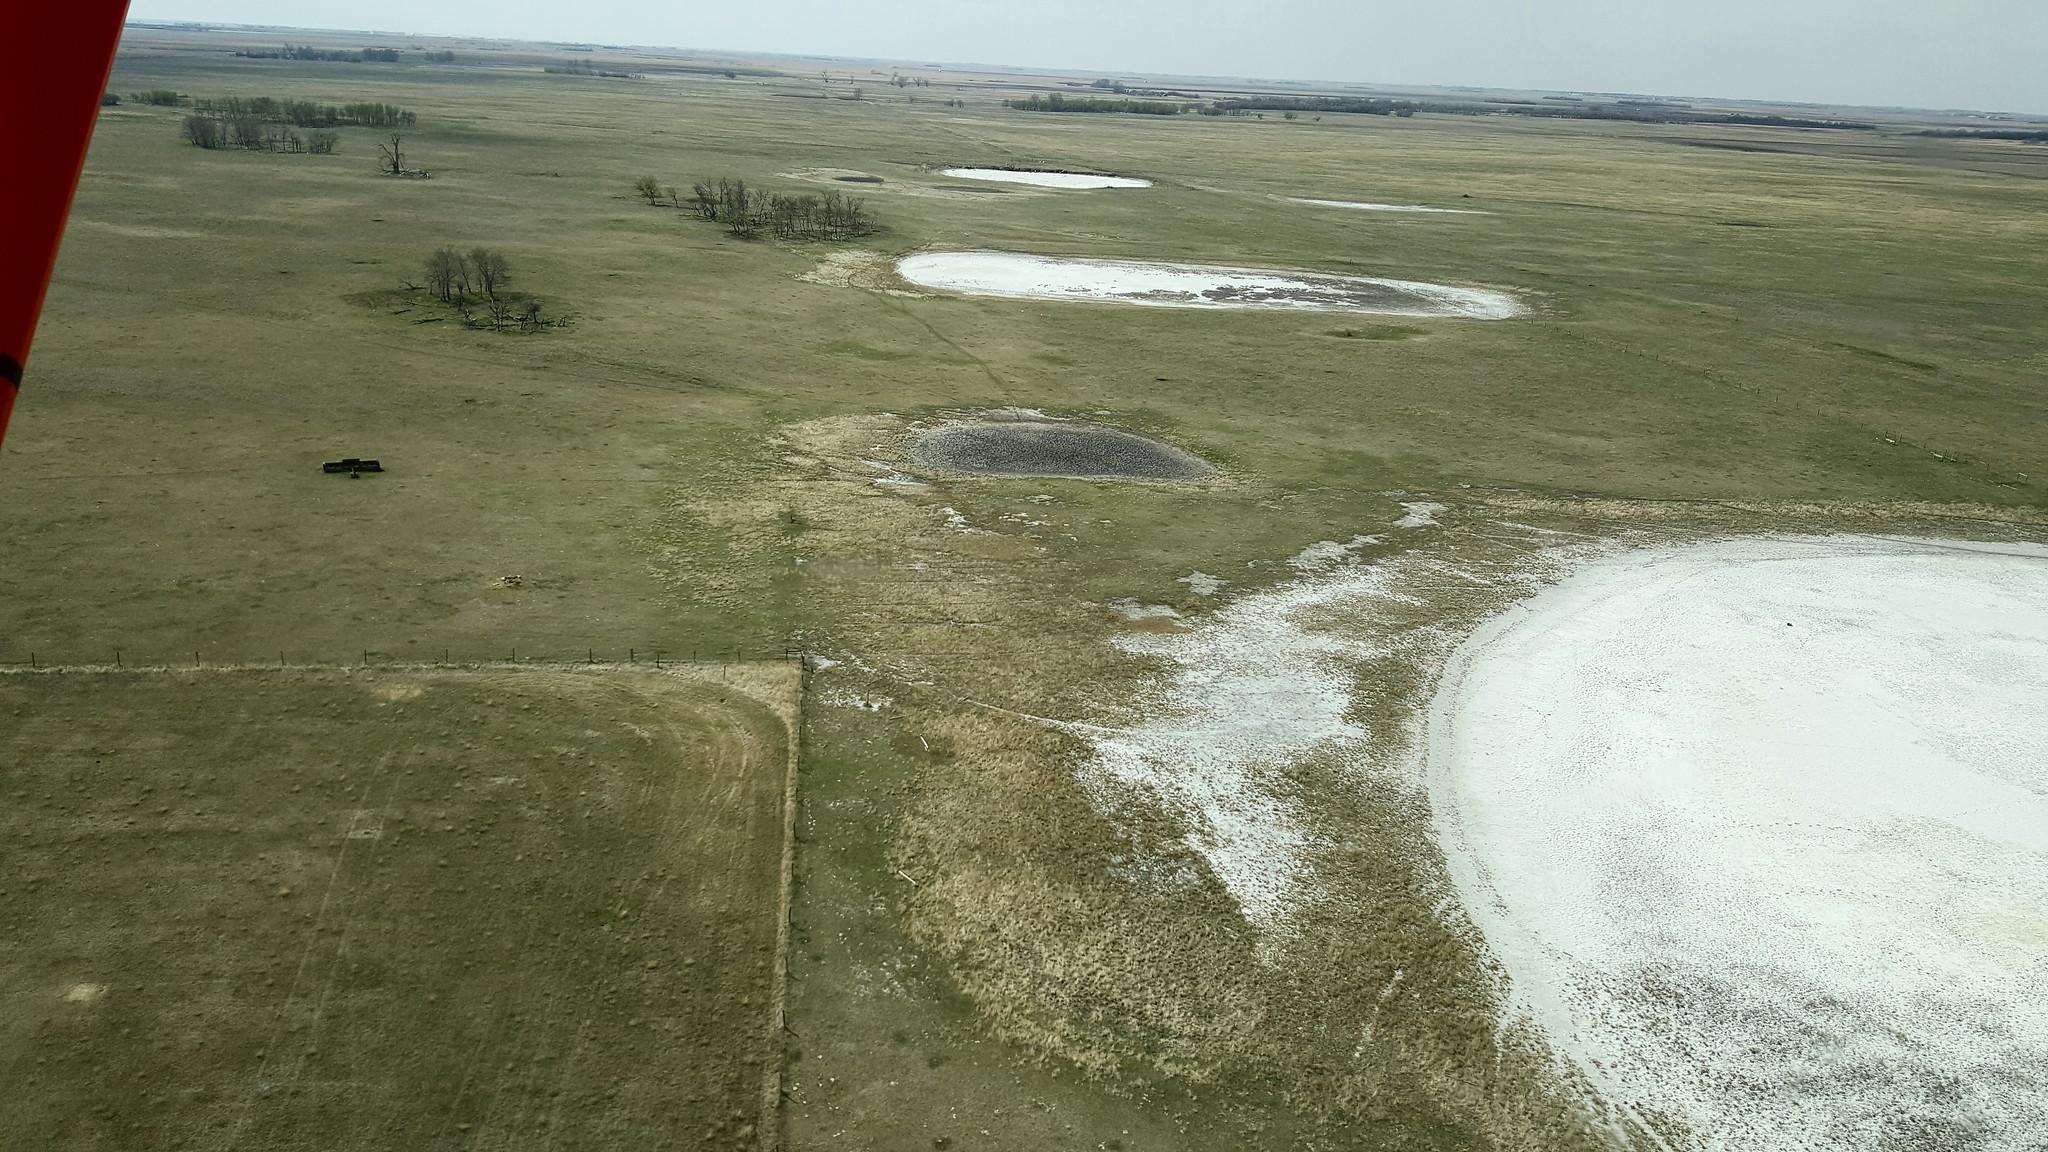 Dry salt flat wetlands near Etters Beach, SK. Photo Credit: Jeff Drahota, USFWS